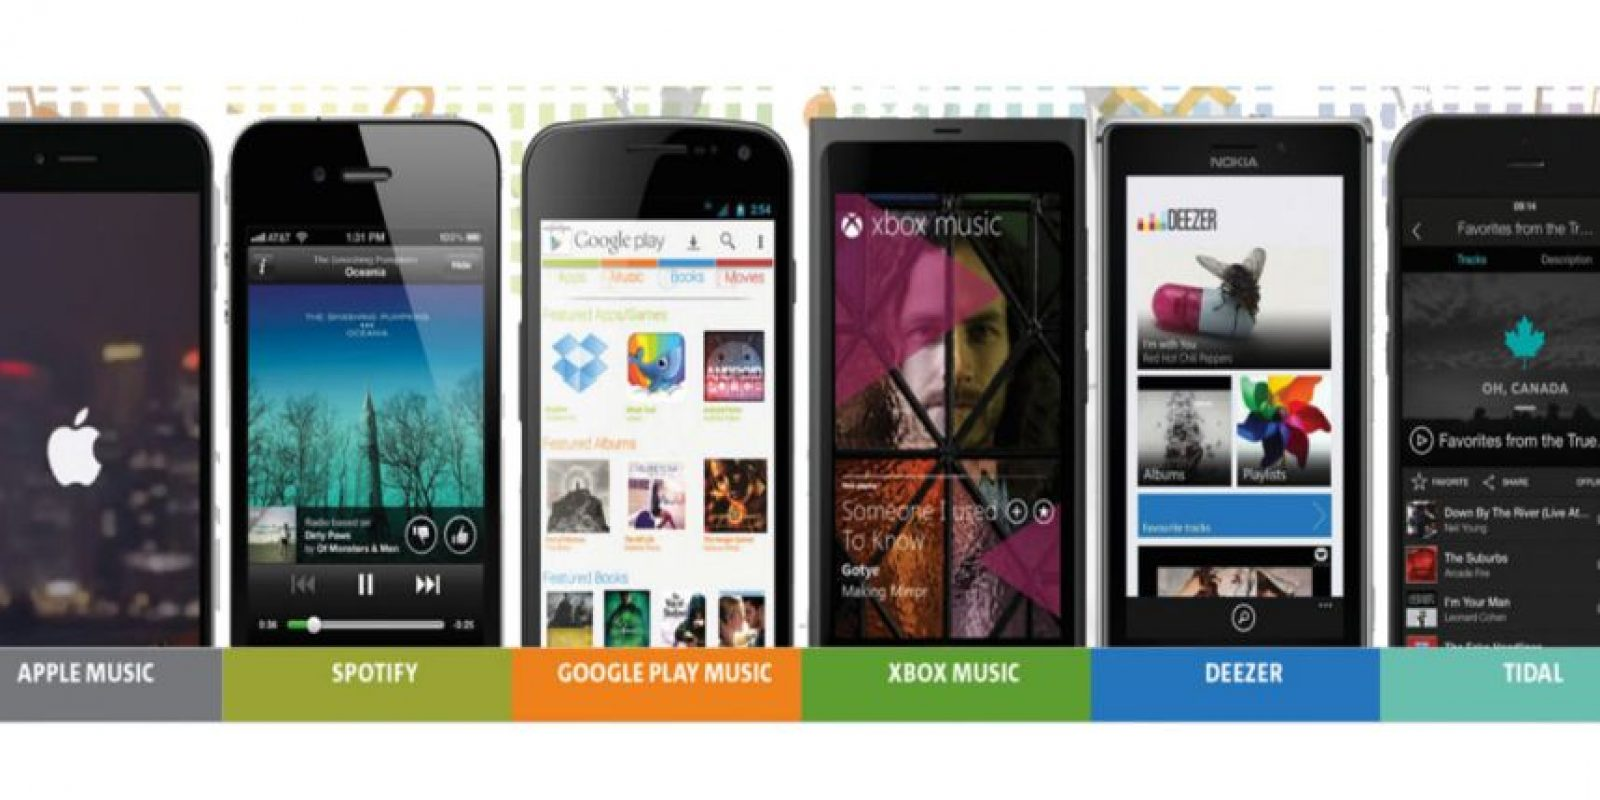 Comparamos todas las app de streaming musical Foto:Apple/Google/Microsoft/Deezer/Tidal